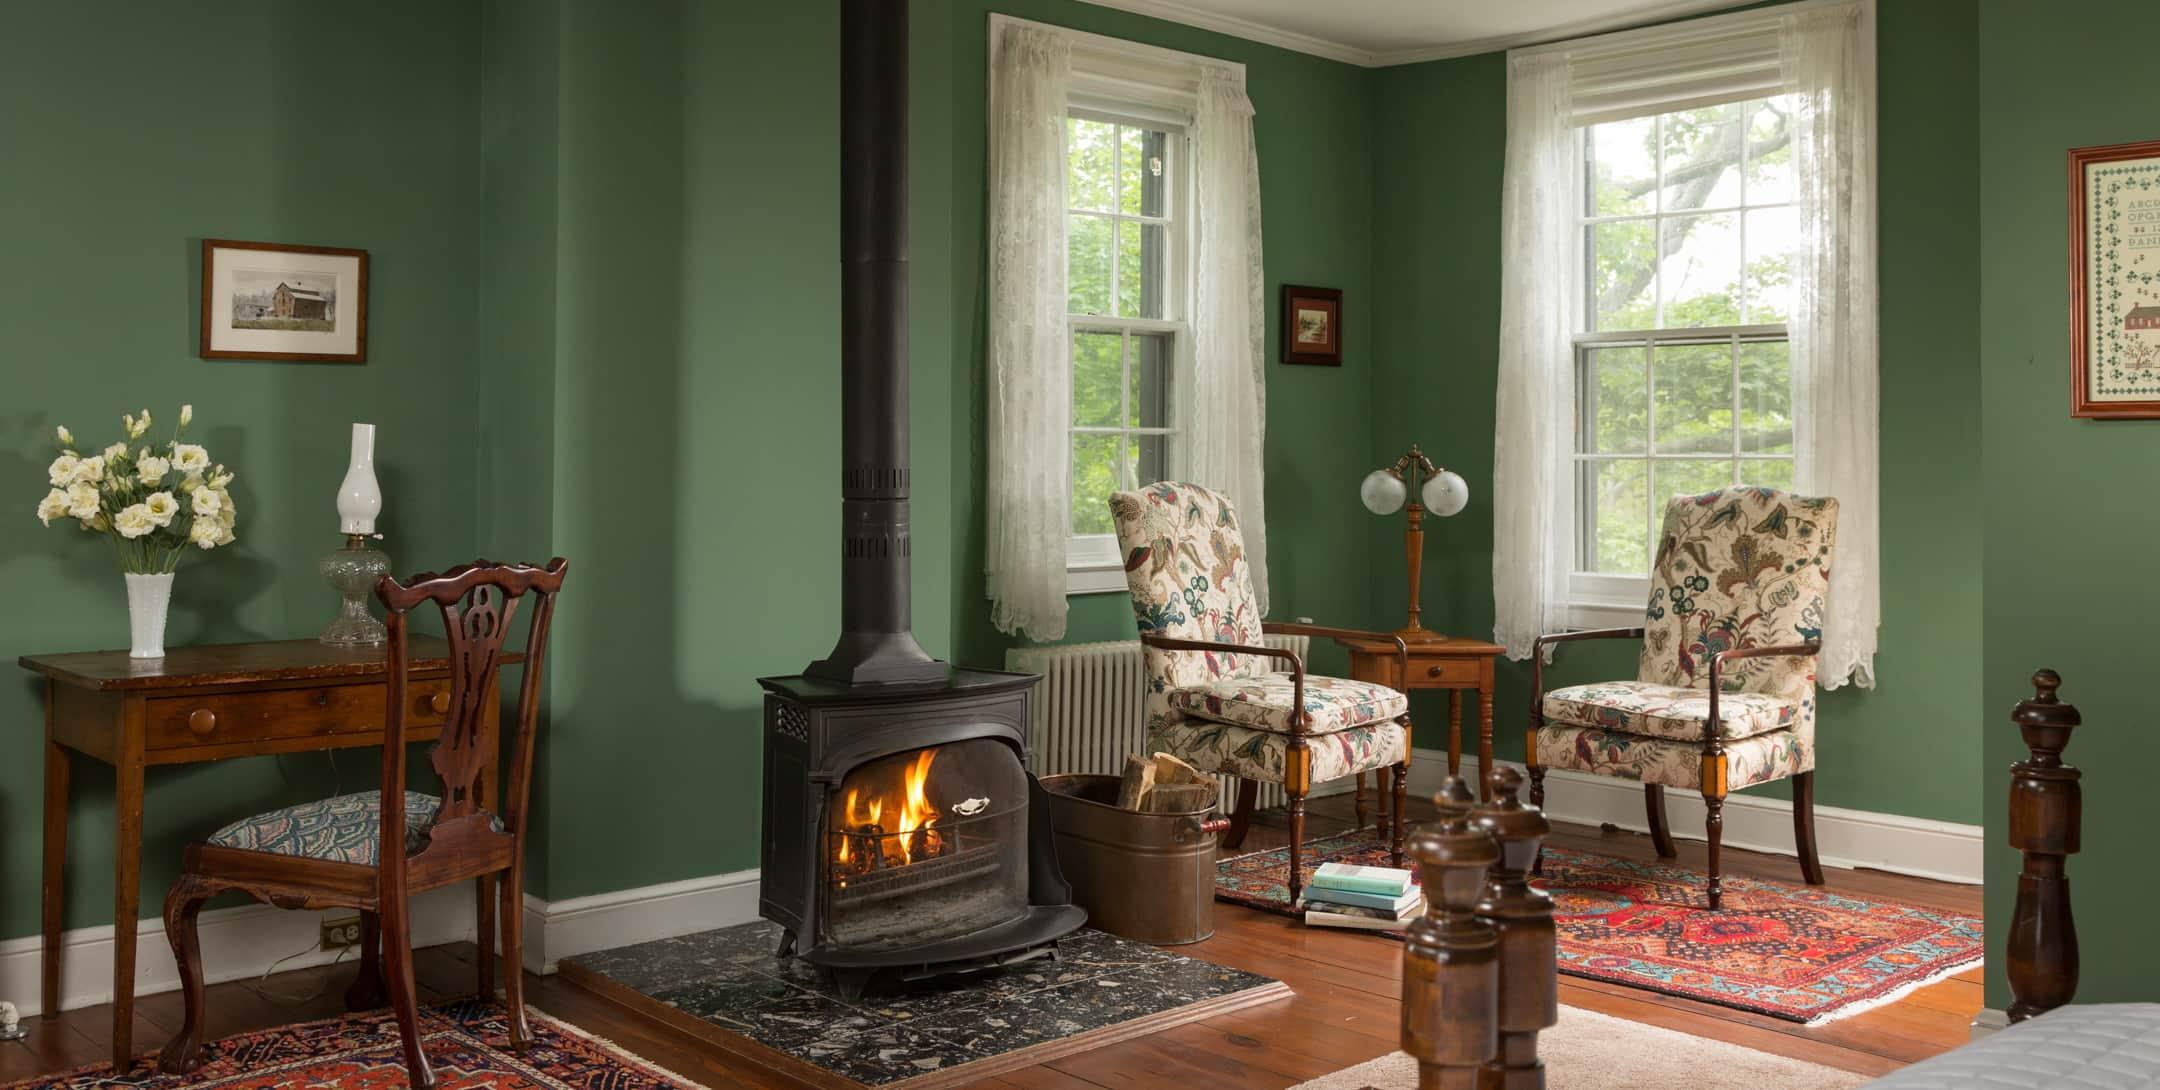 Green Room - Romantic Chestertown Lodging